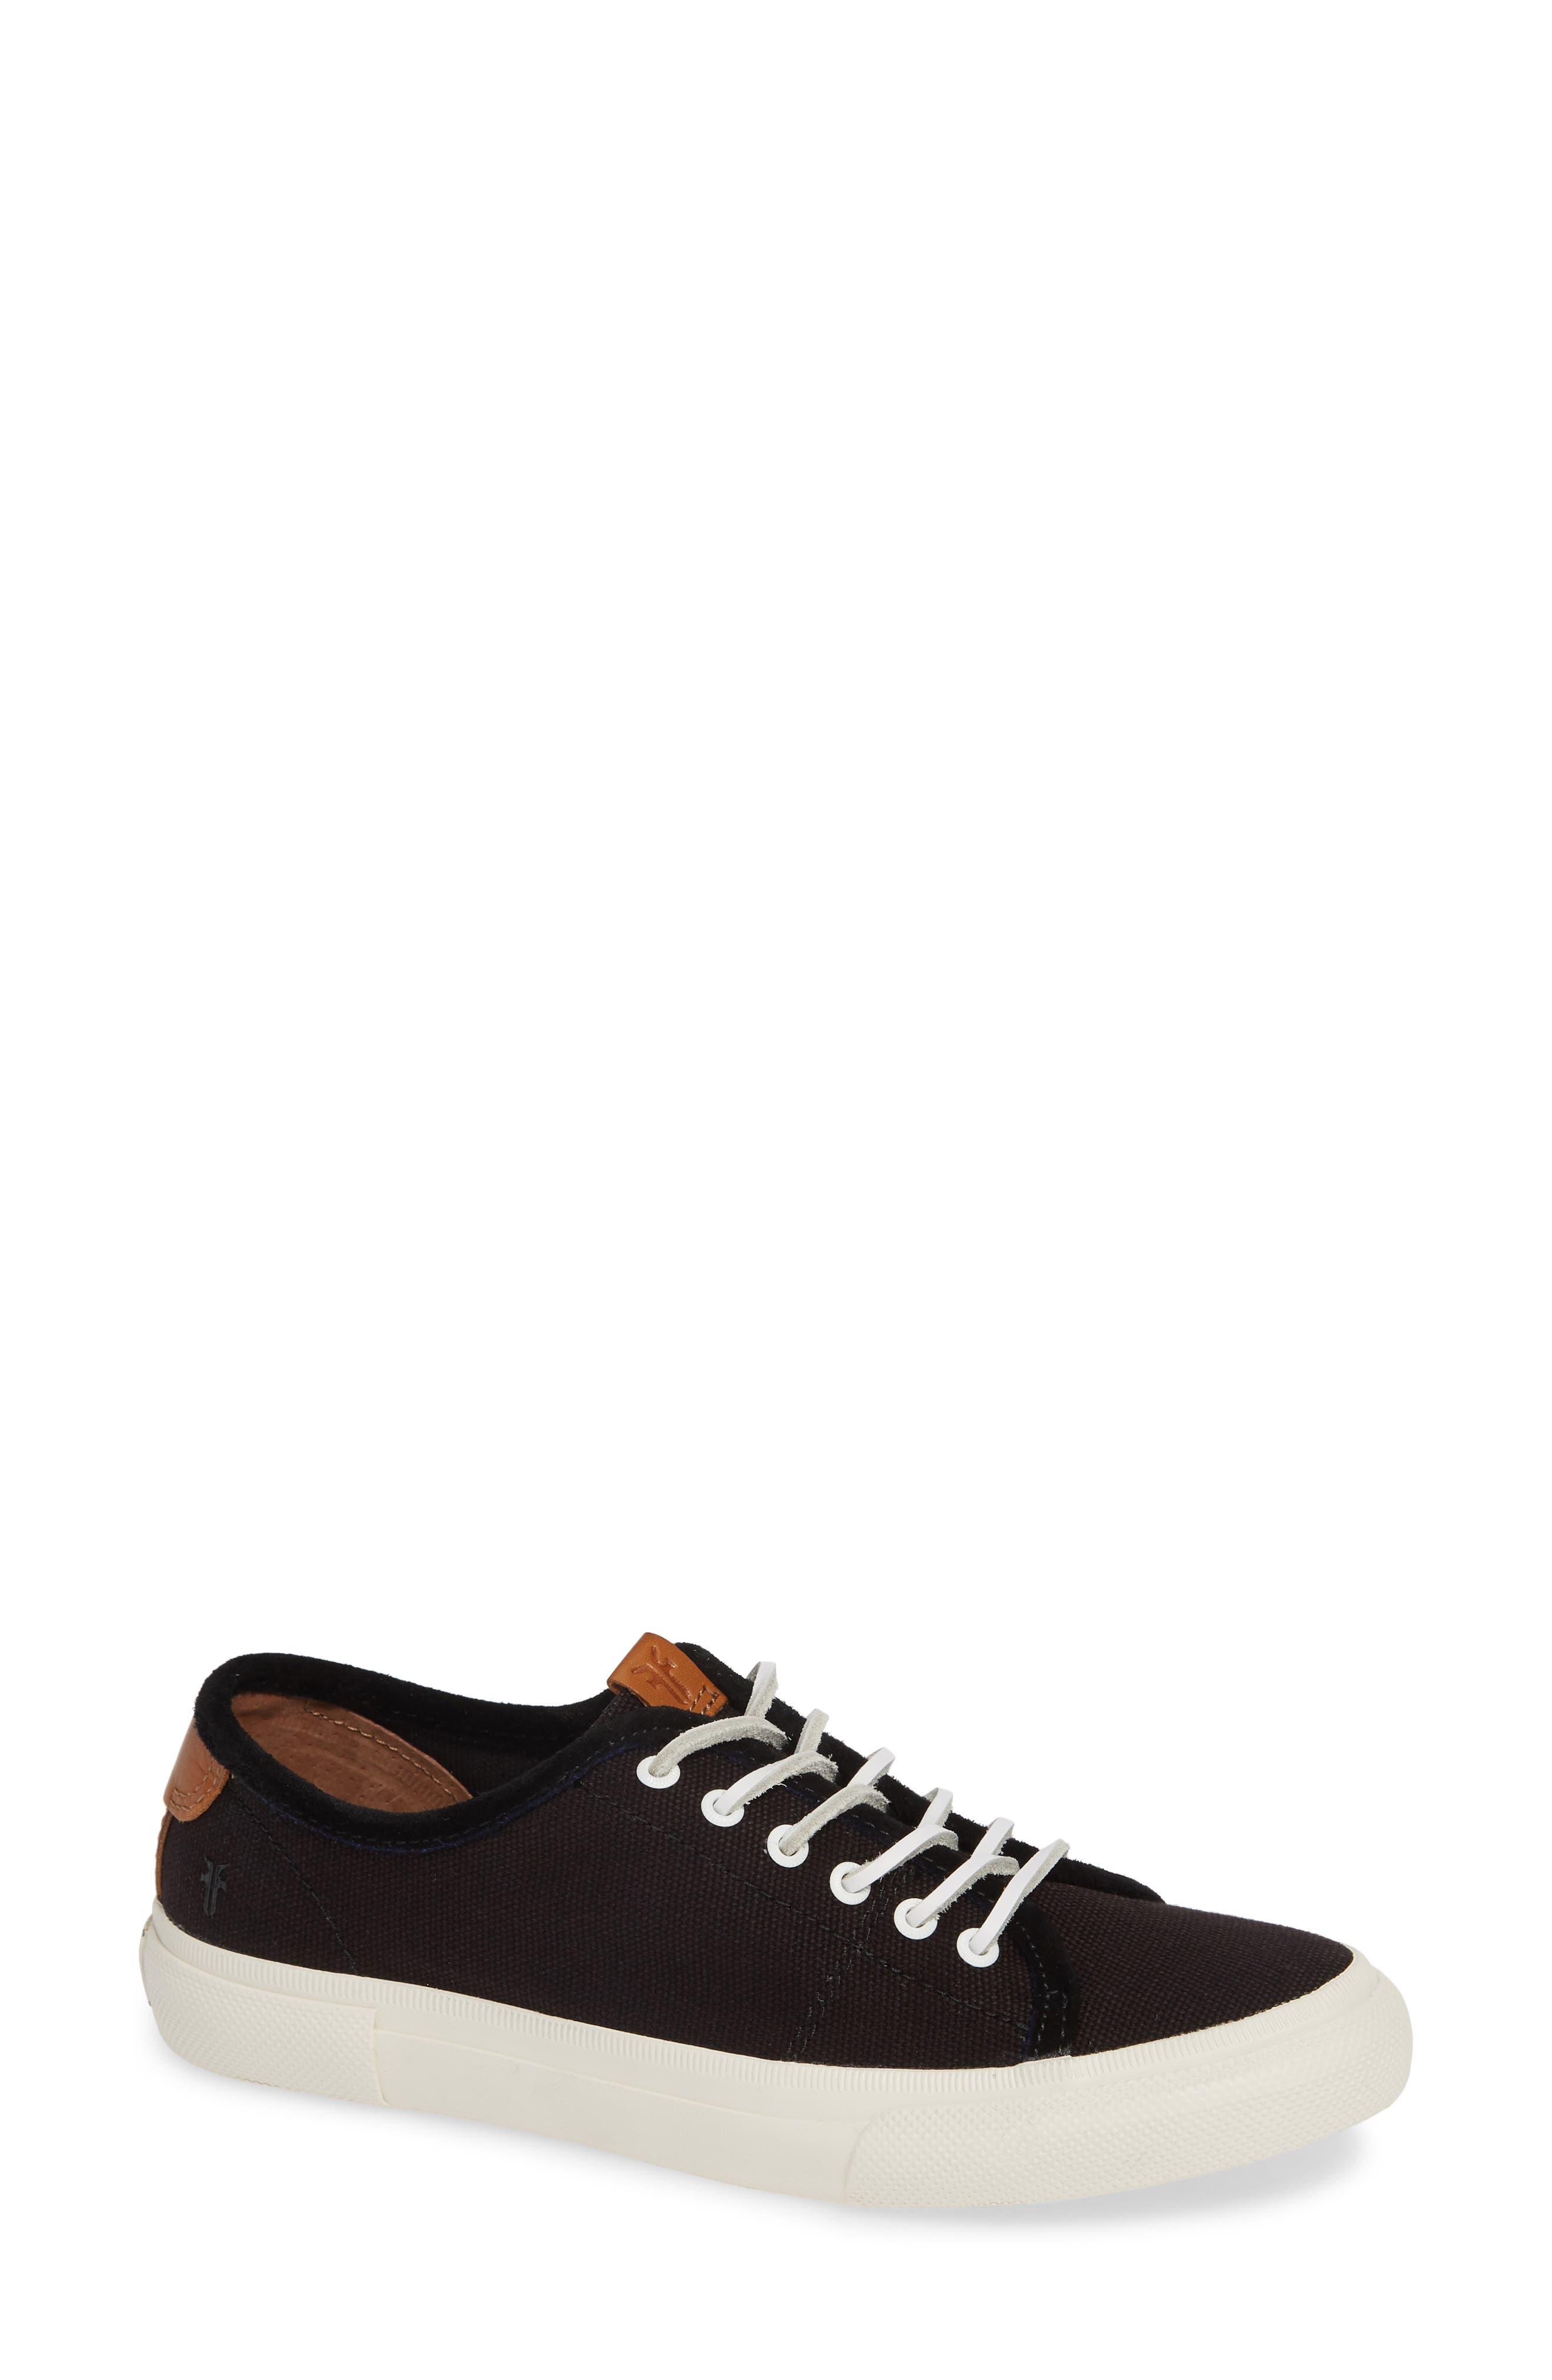 Frye Gia Low Lace-Up Sneaker- Black